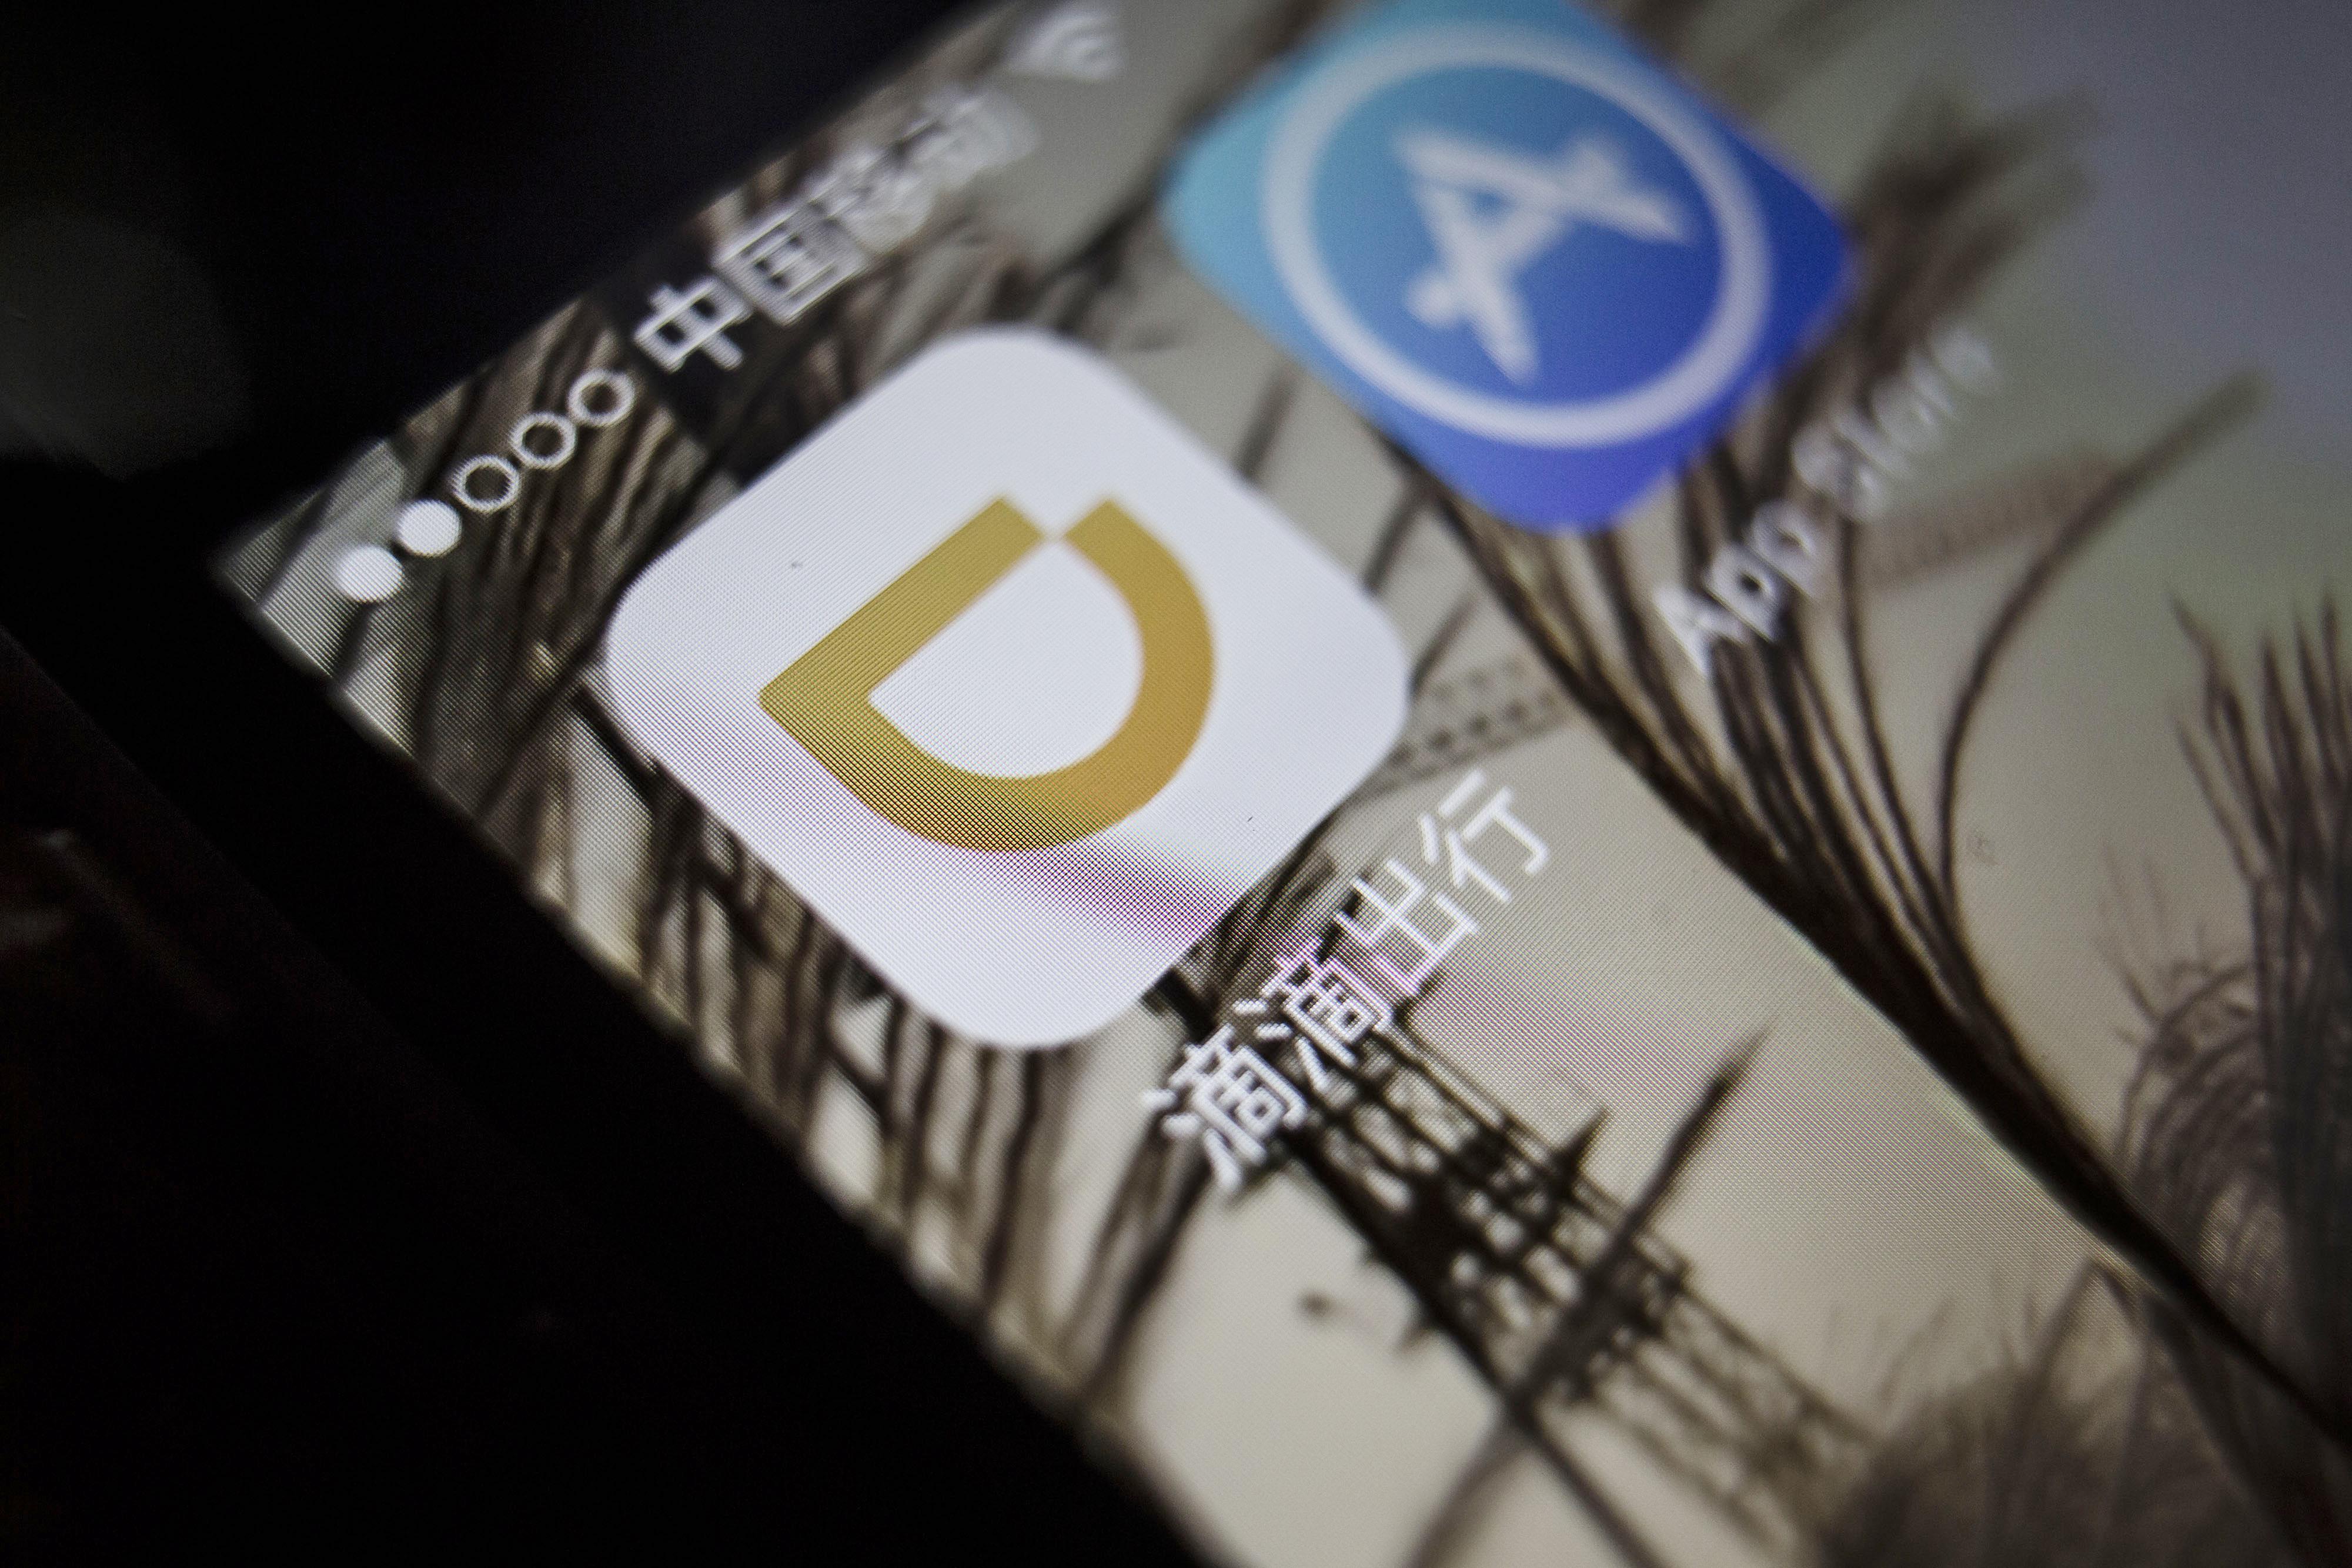 Didi logo shown on a smartphone